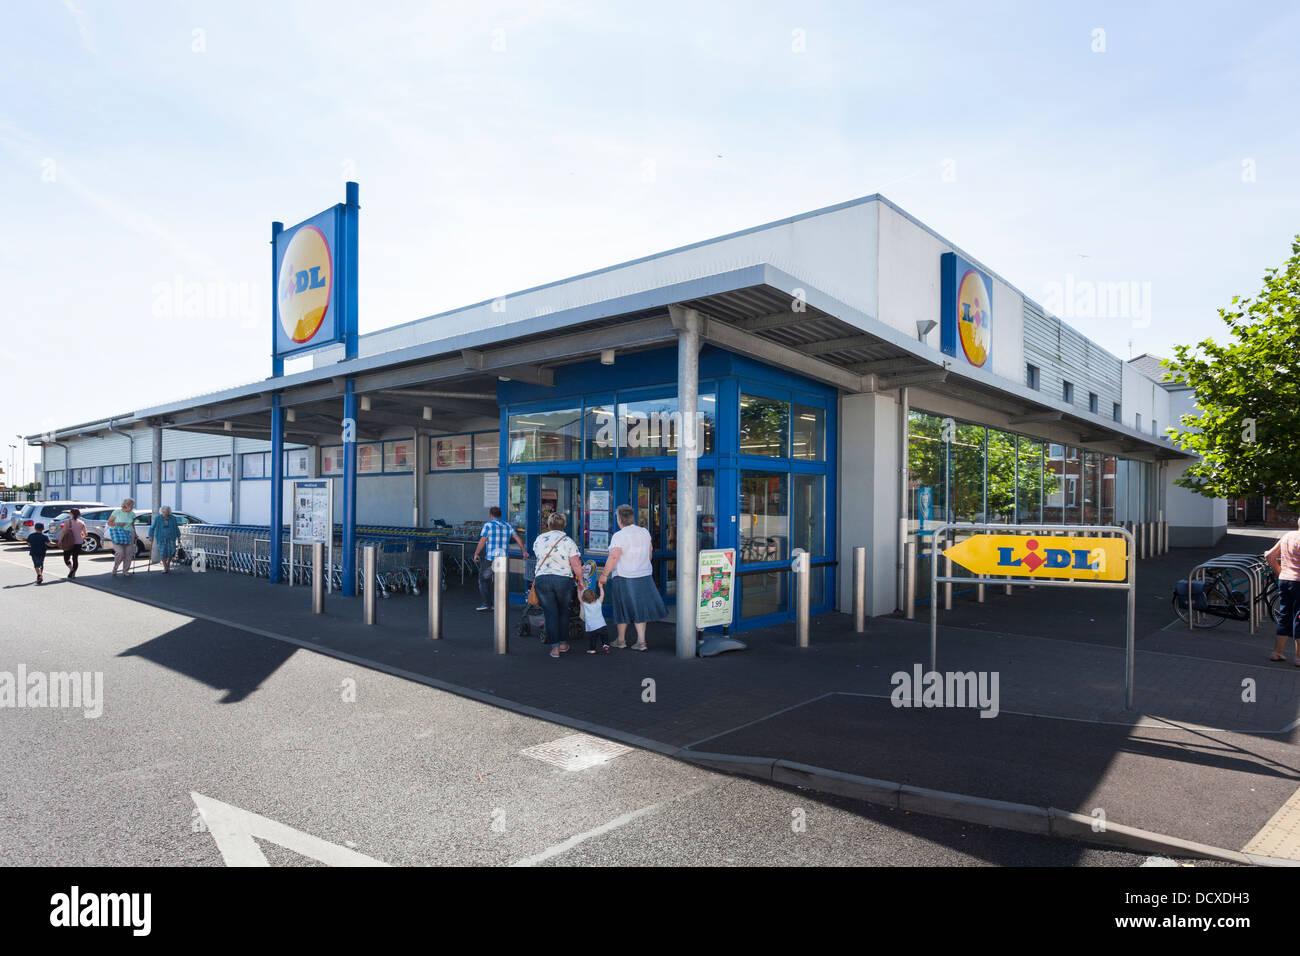 Lidl Supermarket Exterior Littlehampton Stock Photo-3079